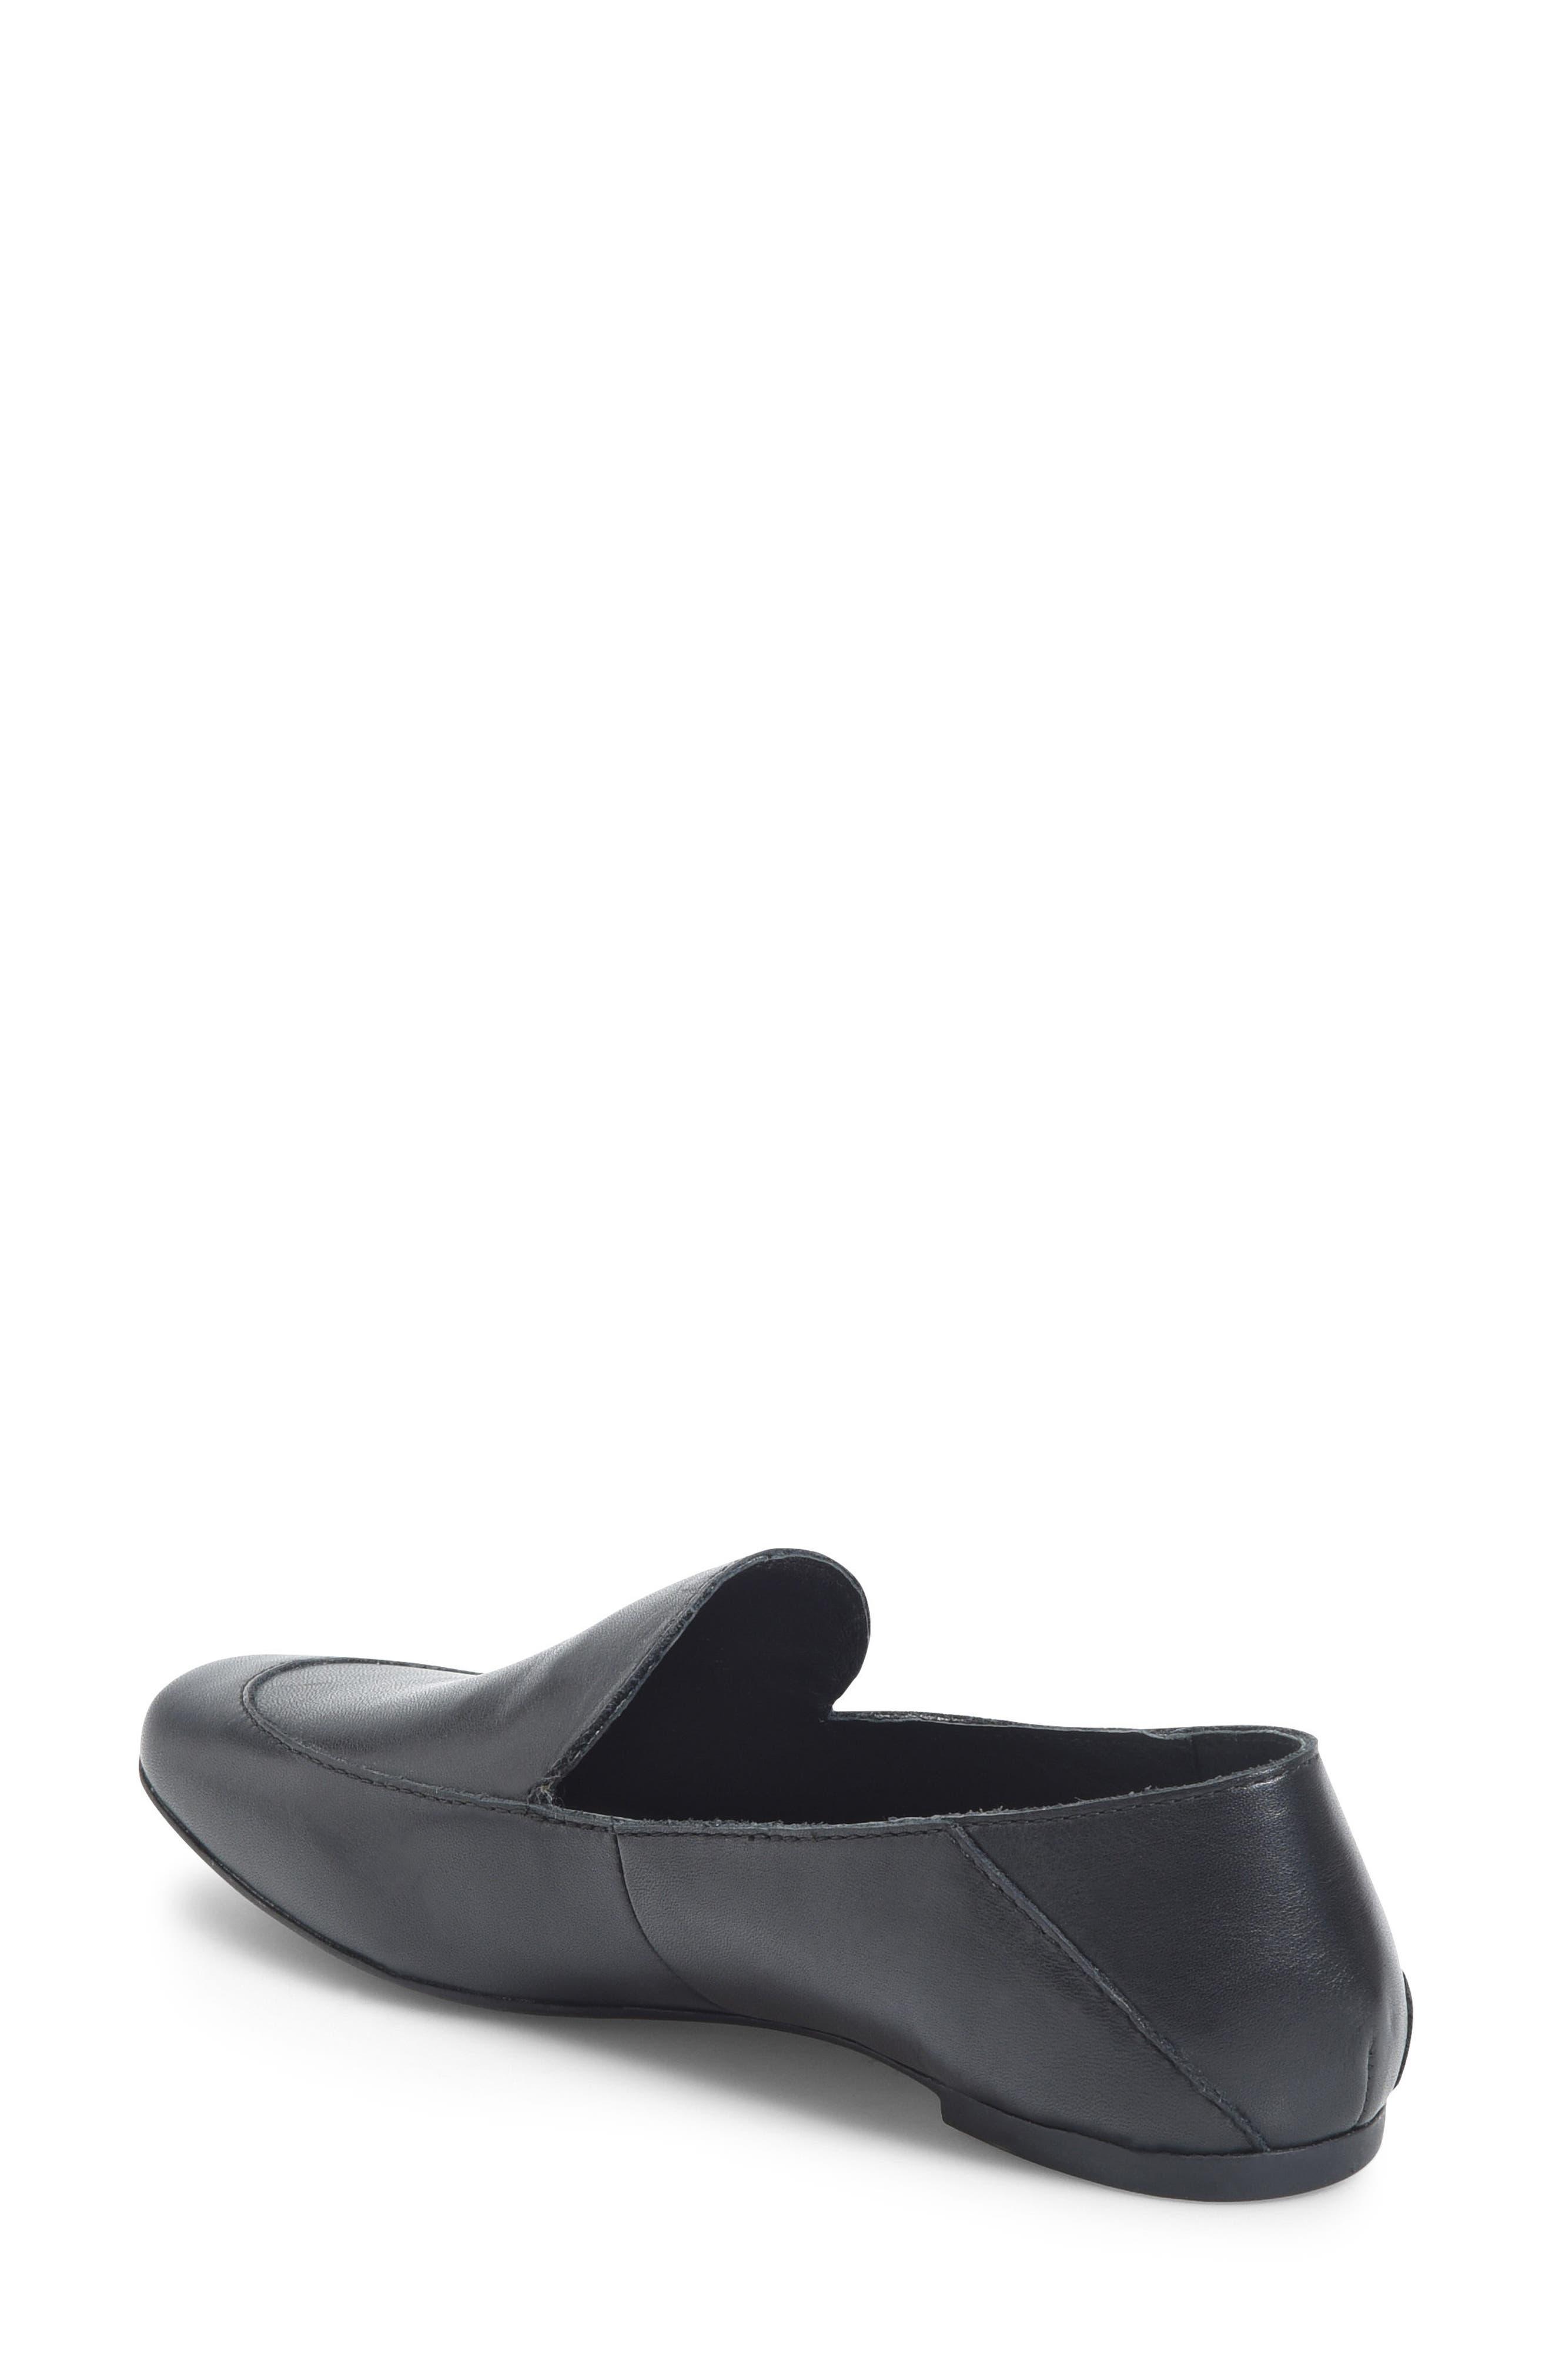 Carib Loafer,                             Alternate thumbnail 2, color,                             Black Leather